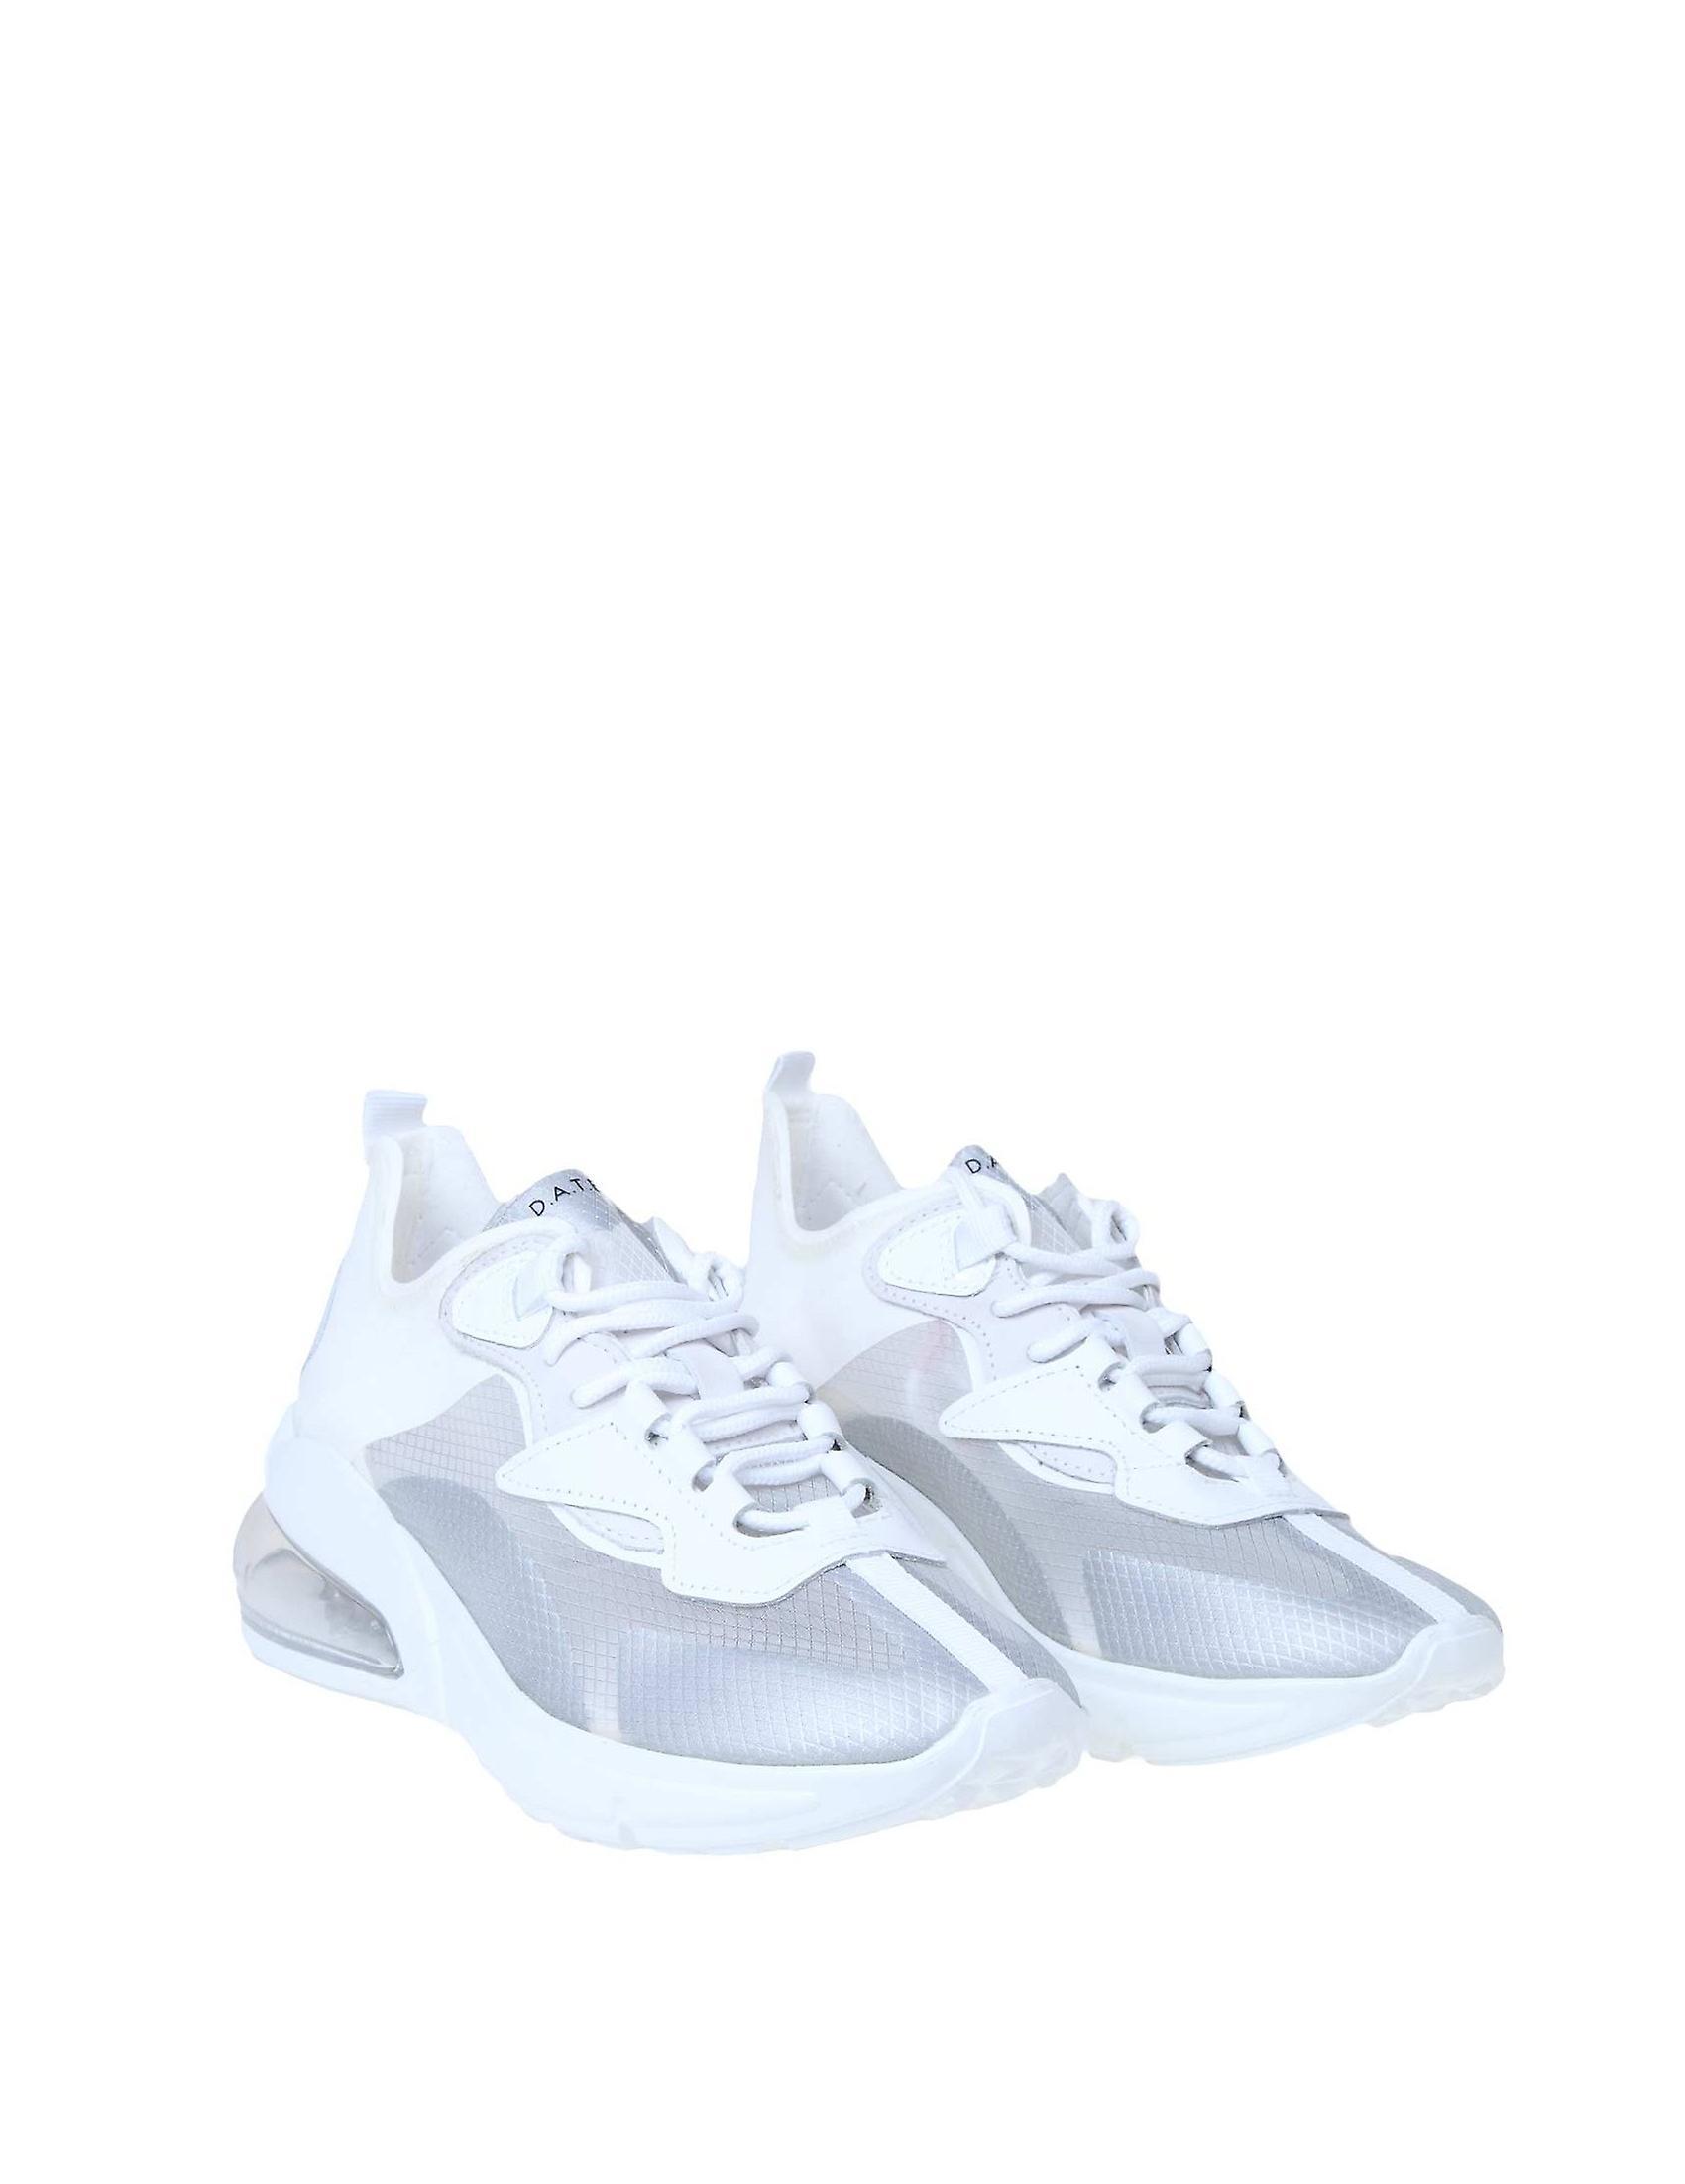 D.a.t.e. W321whtgrey Donne's White Fabric Sneakers